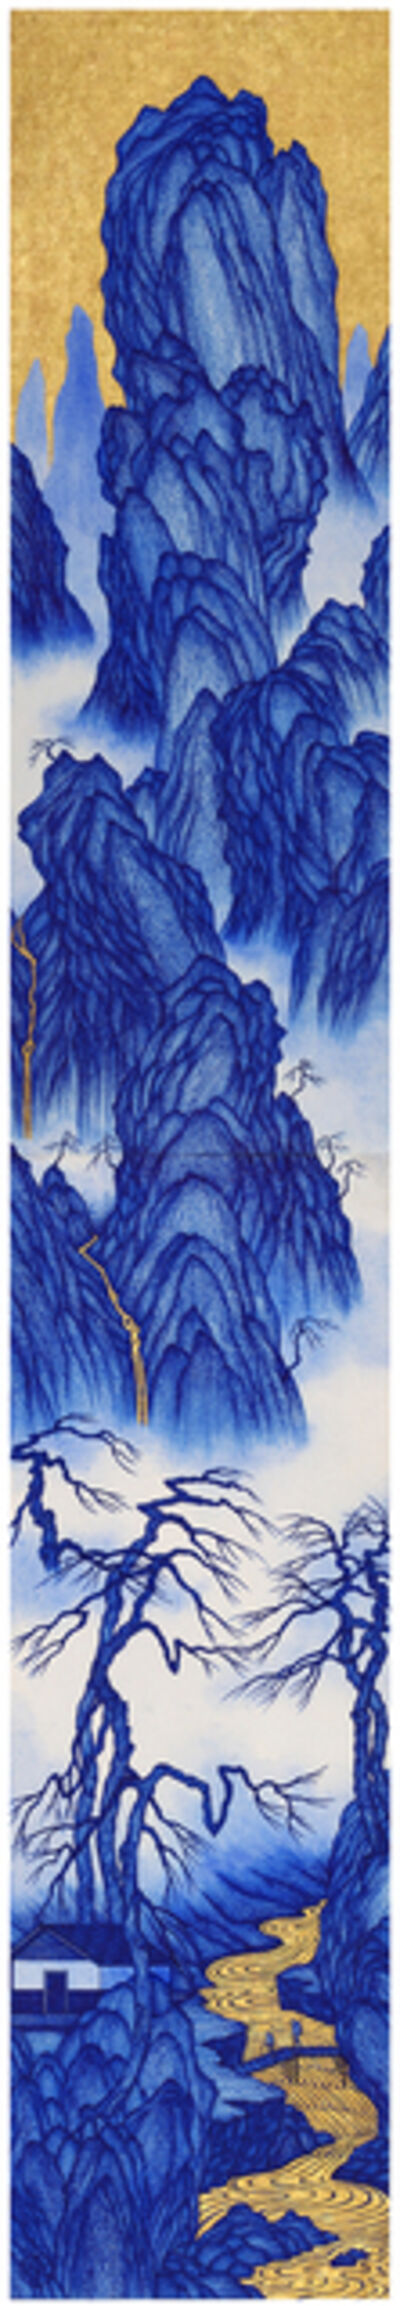 Yao Jui-chung 姚瑞中, 'Good Times: Cloud Villa   ', 2014